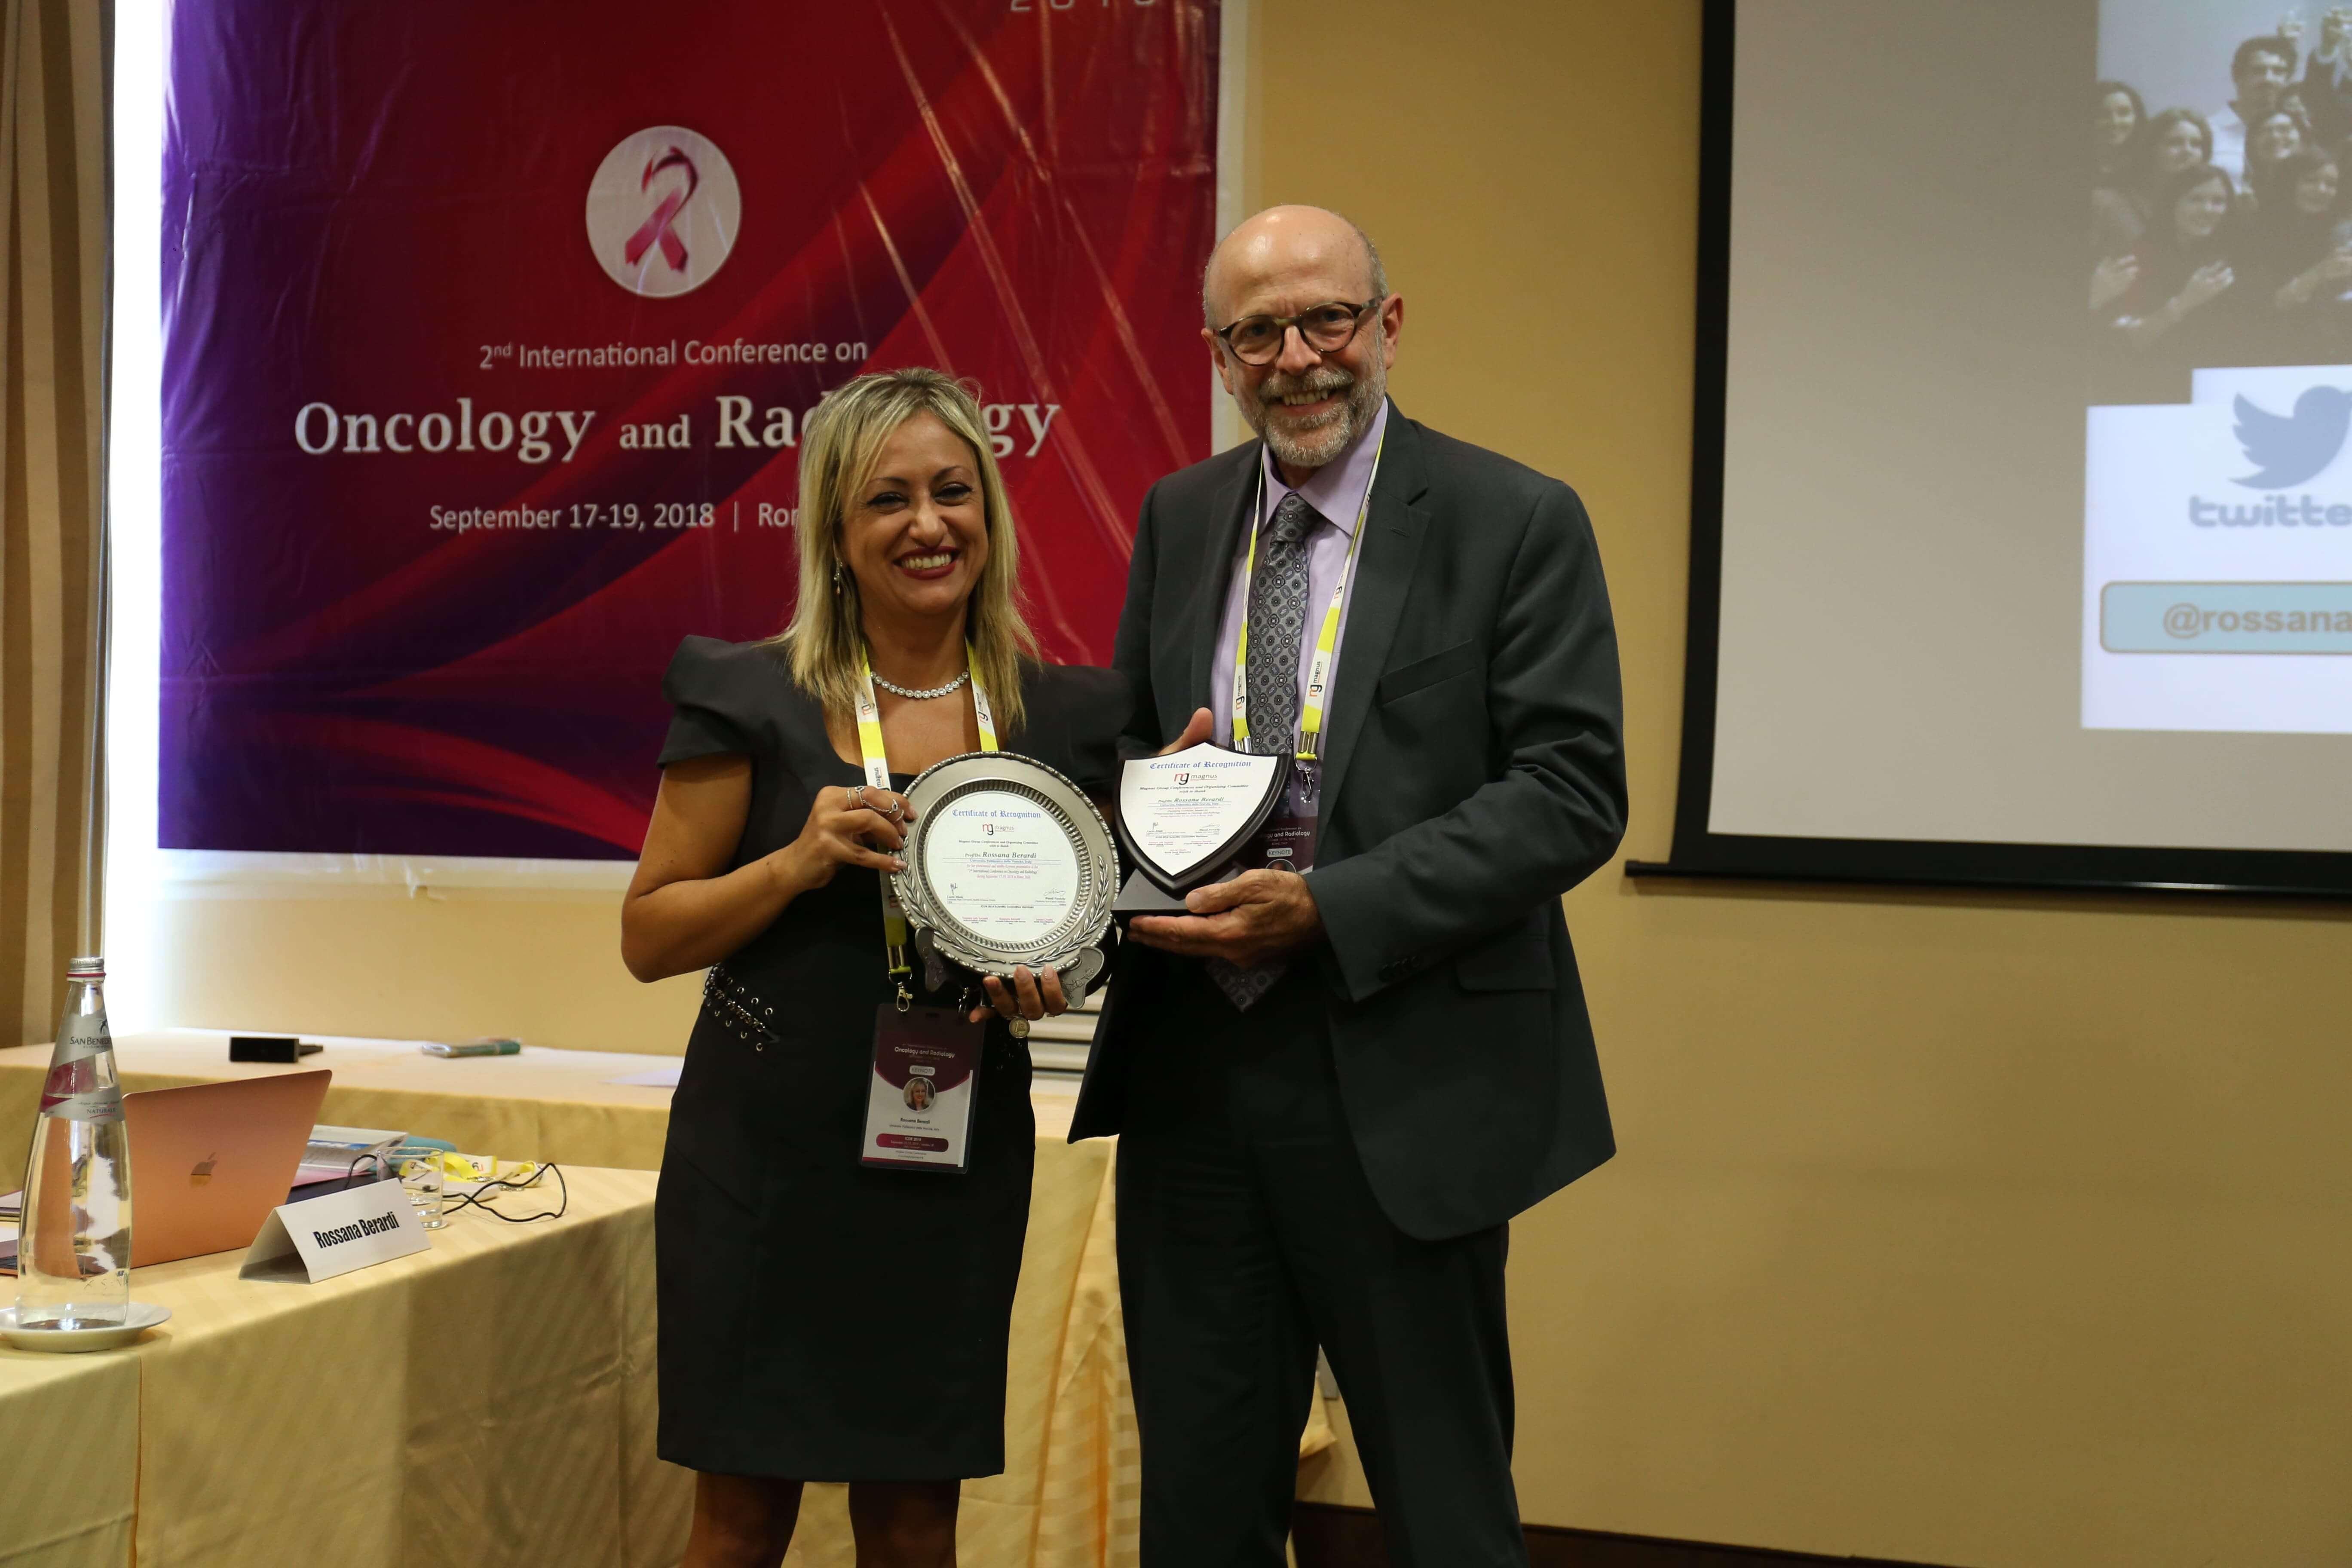 Cancer Conferences - Rossana Berardi